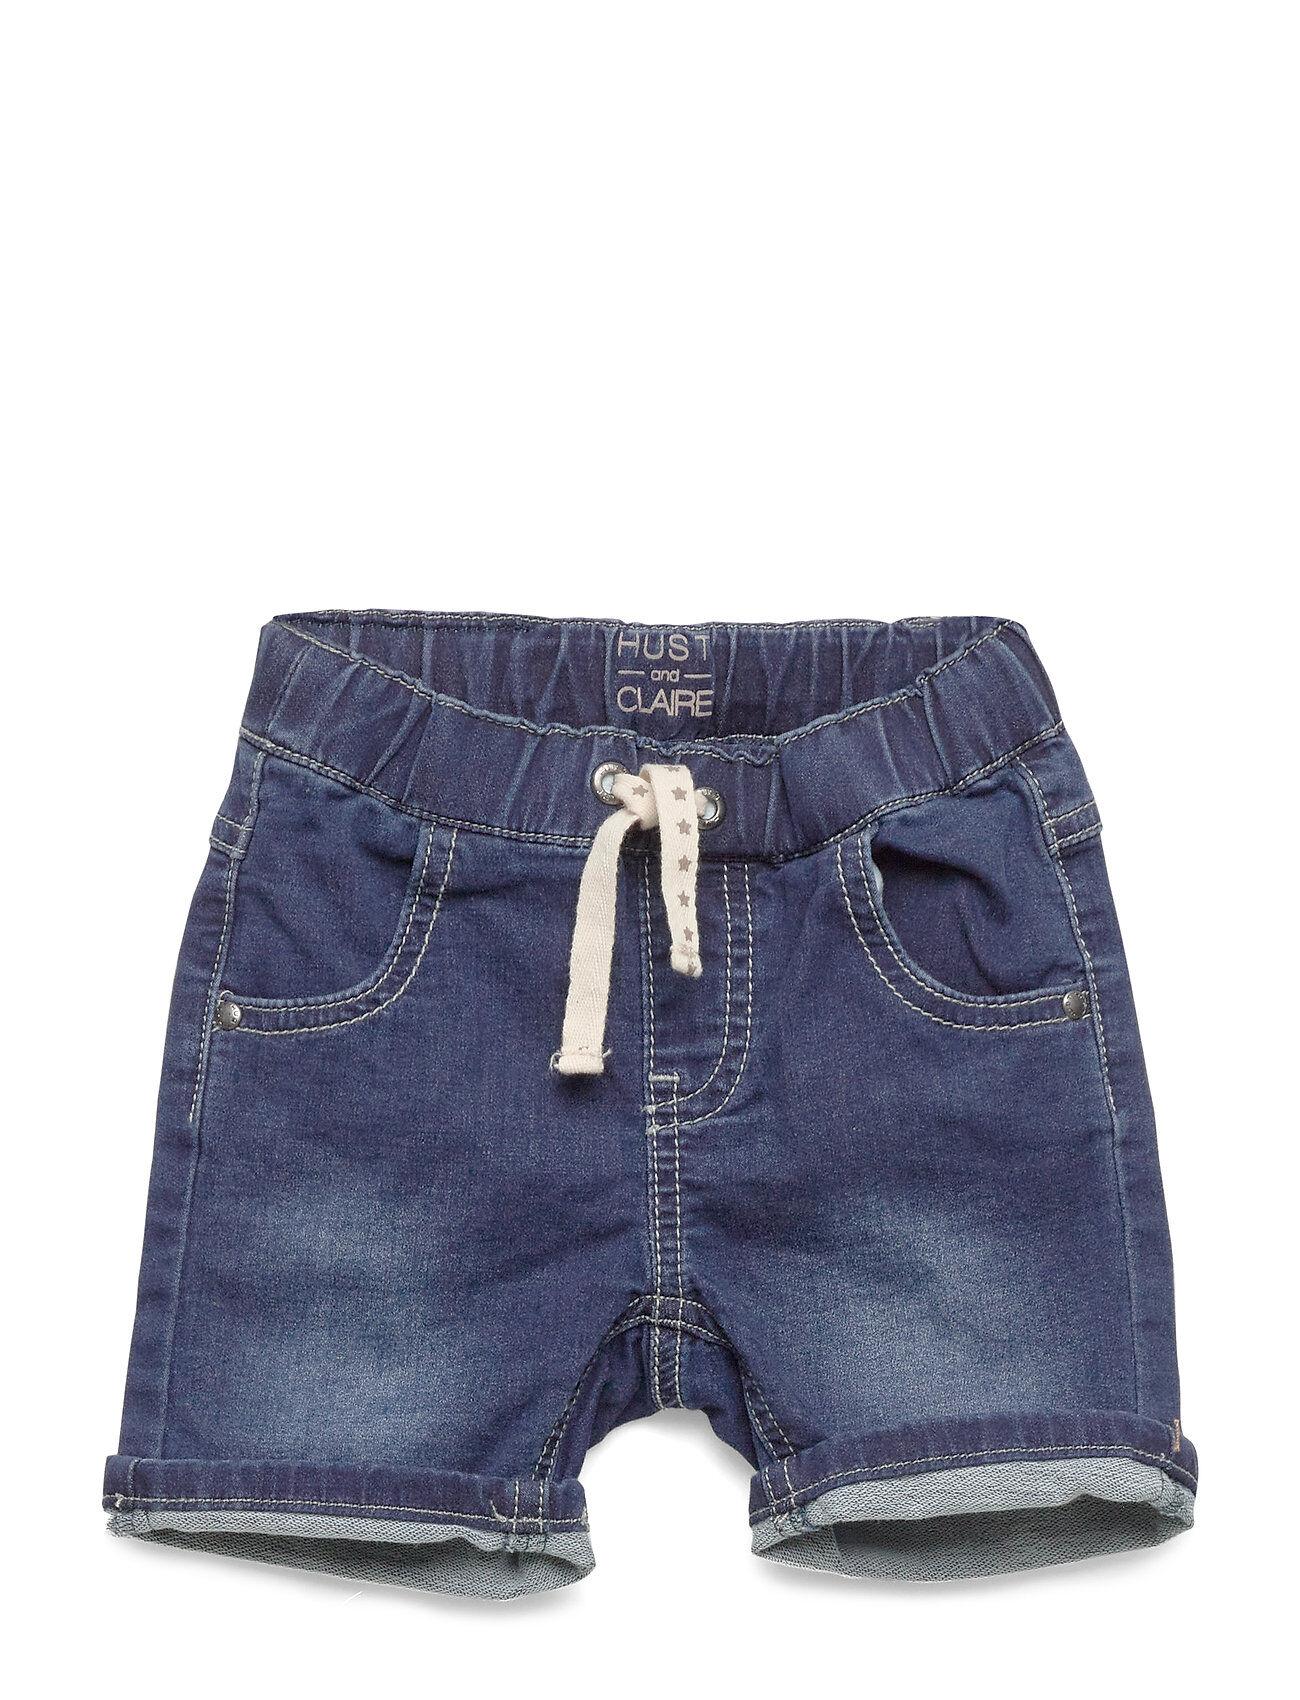 Hust & Claire Jes - Bermuda Shorts Shortsit Sininen Hust & Claire